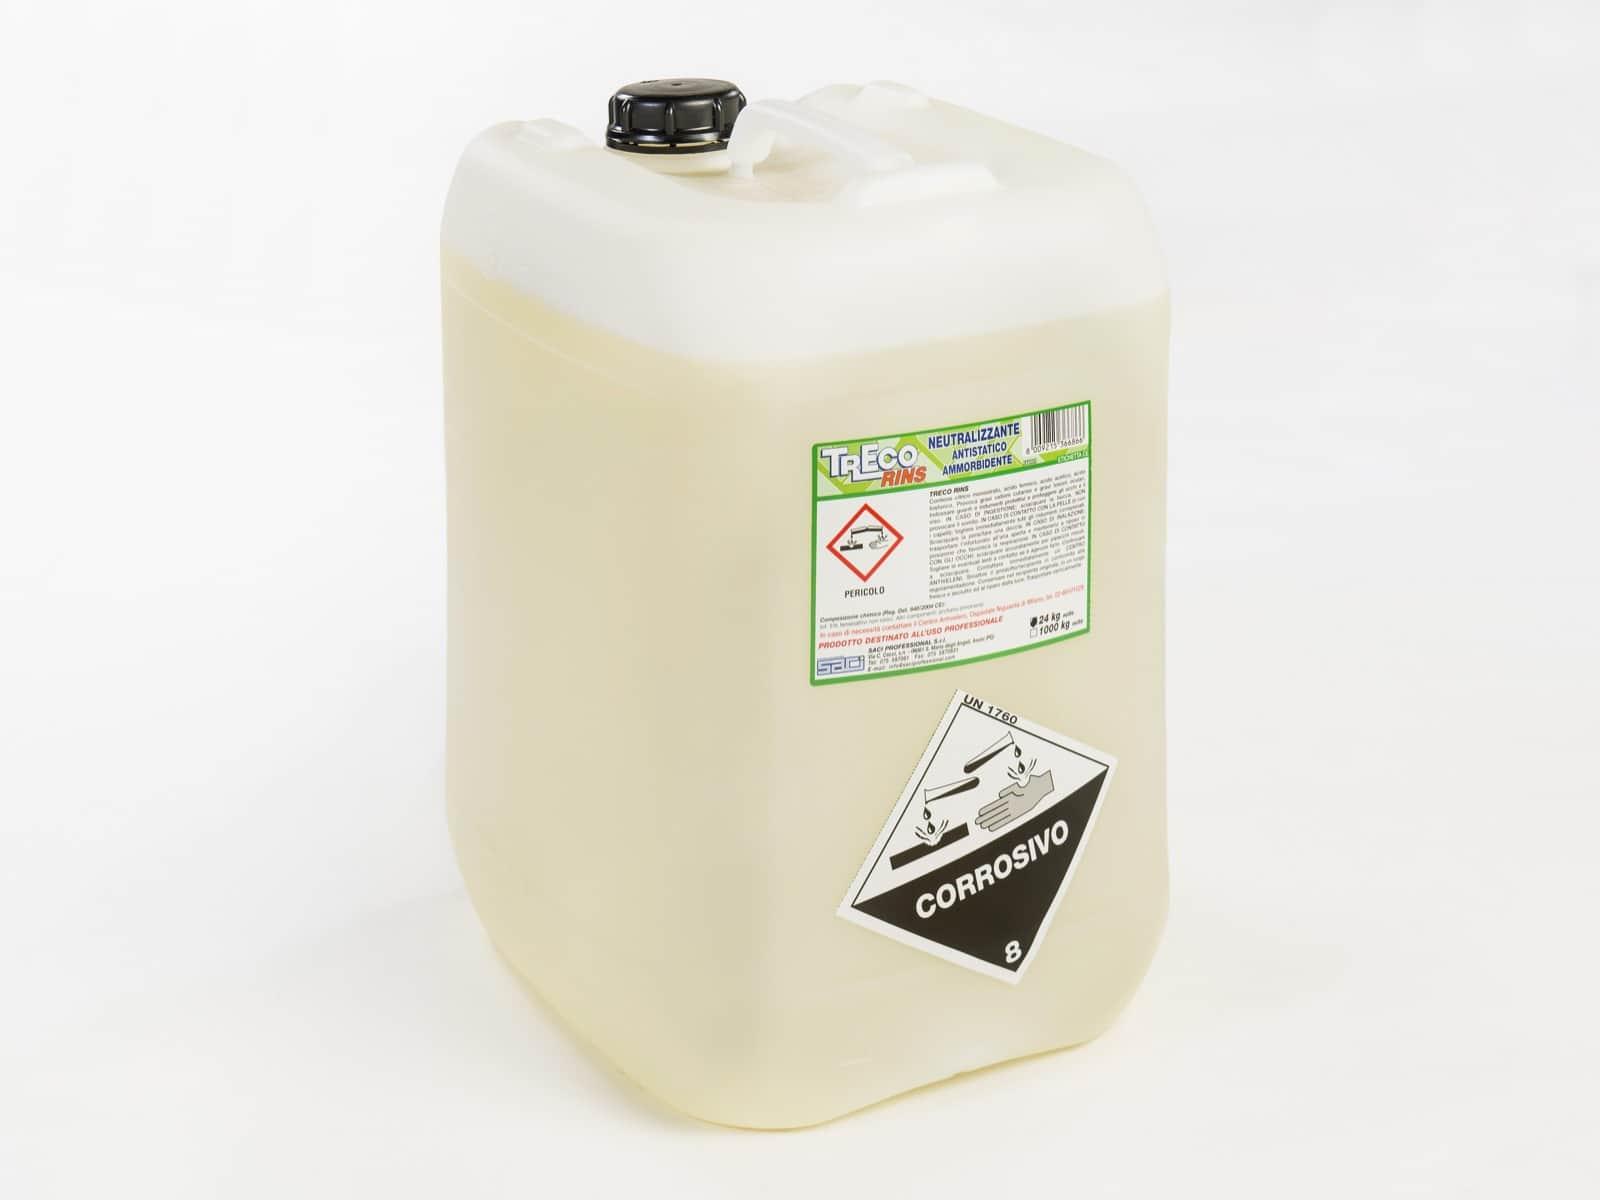 Treco Rins neutralizzante ammorbidente 24kg - Defir detergenti Moncalieri Torino